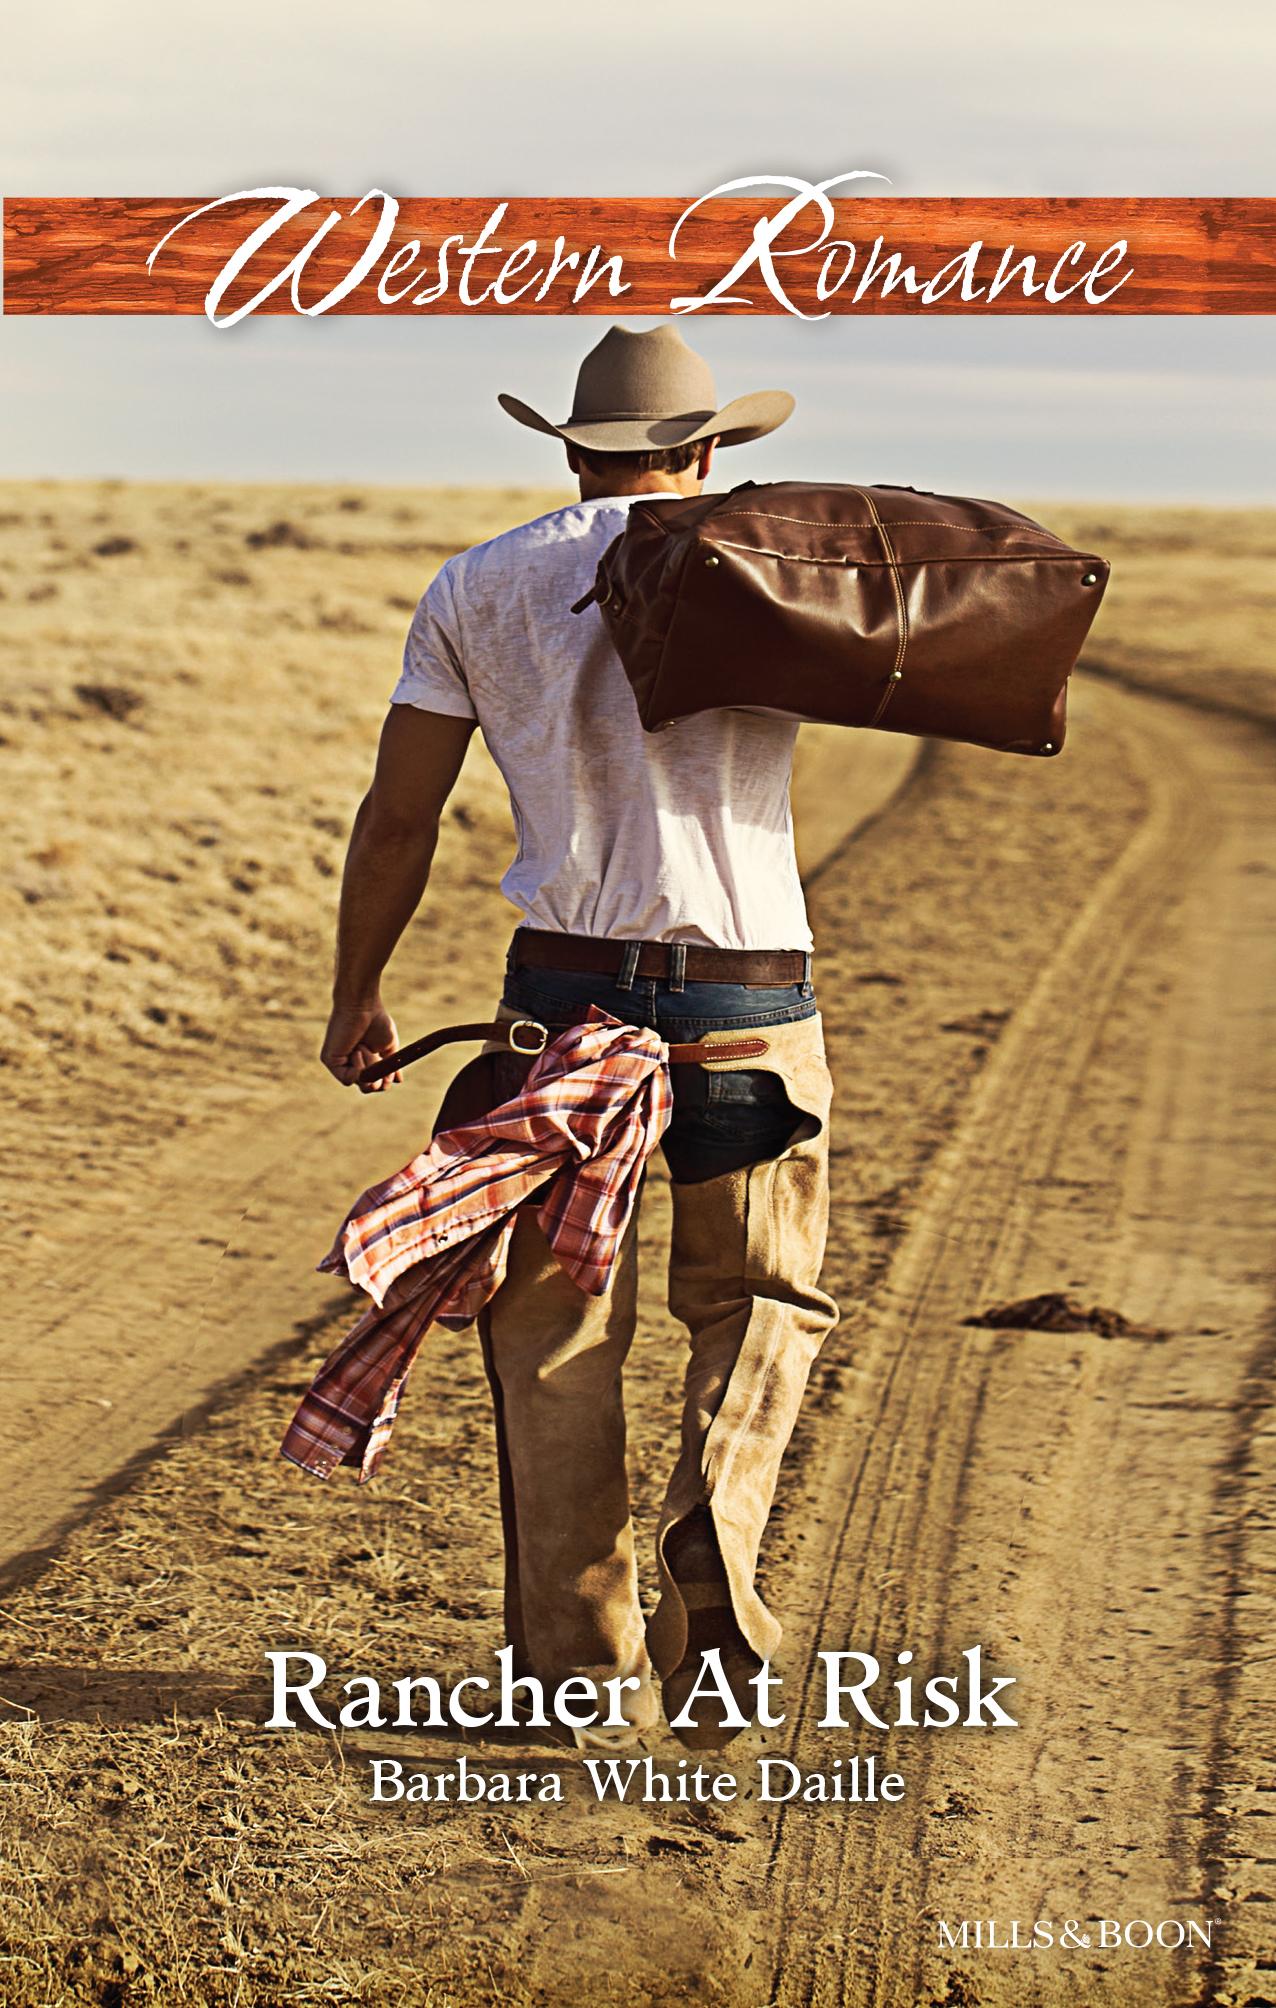 Rancher At Risk Barbara White Daille